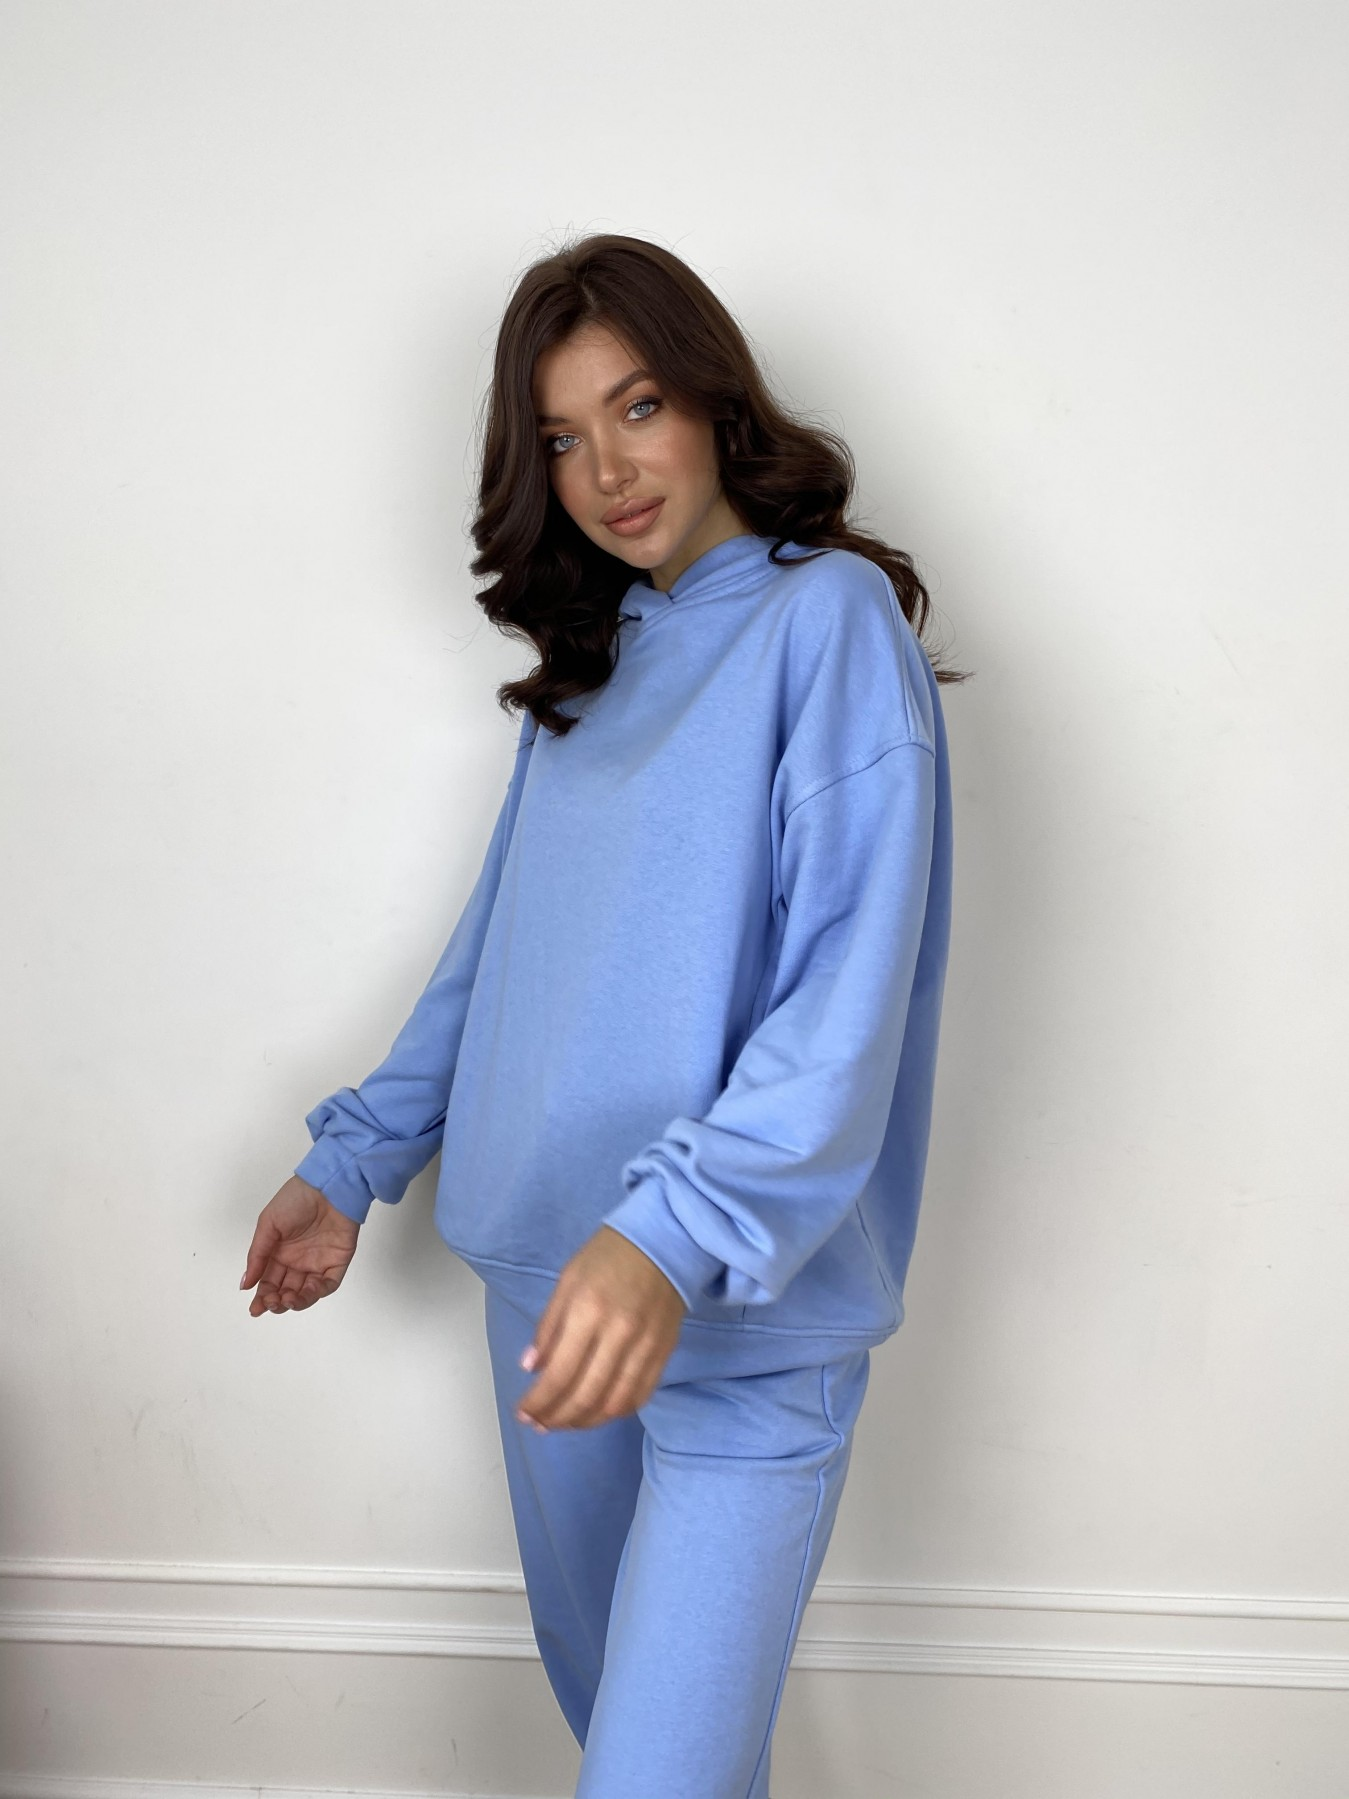 Марион костюм из 3х нитки 10581 АРТ. 46937 Цвет: Голубой - фото 2, интернет магазин tm-modus.ru